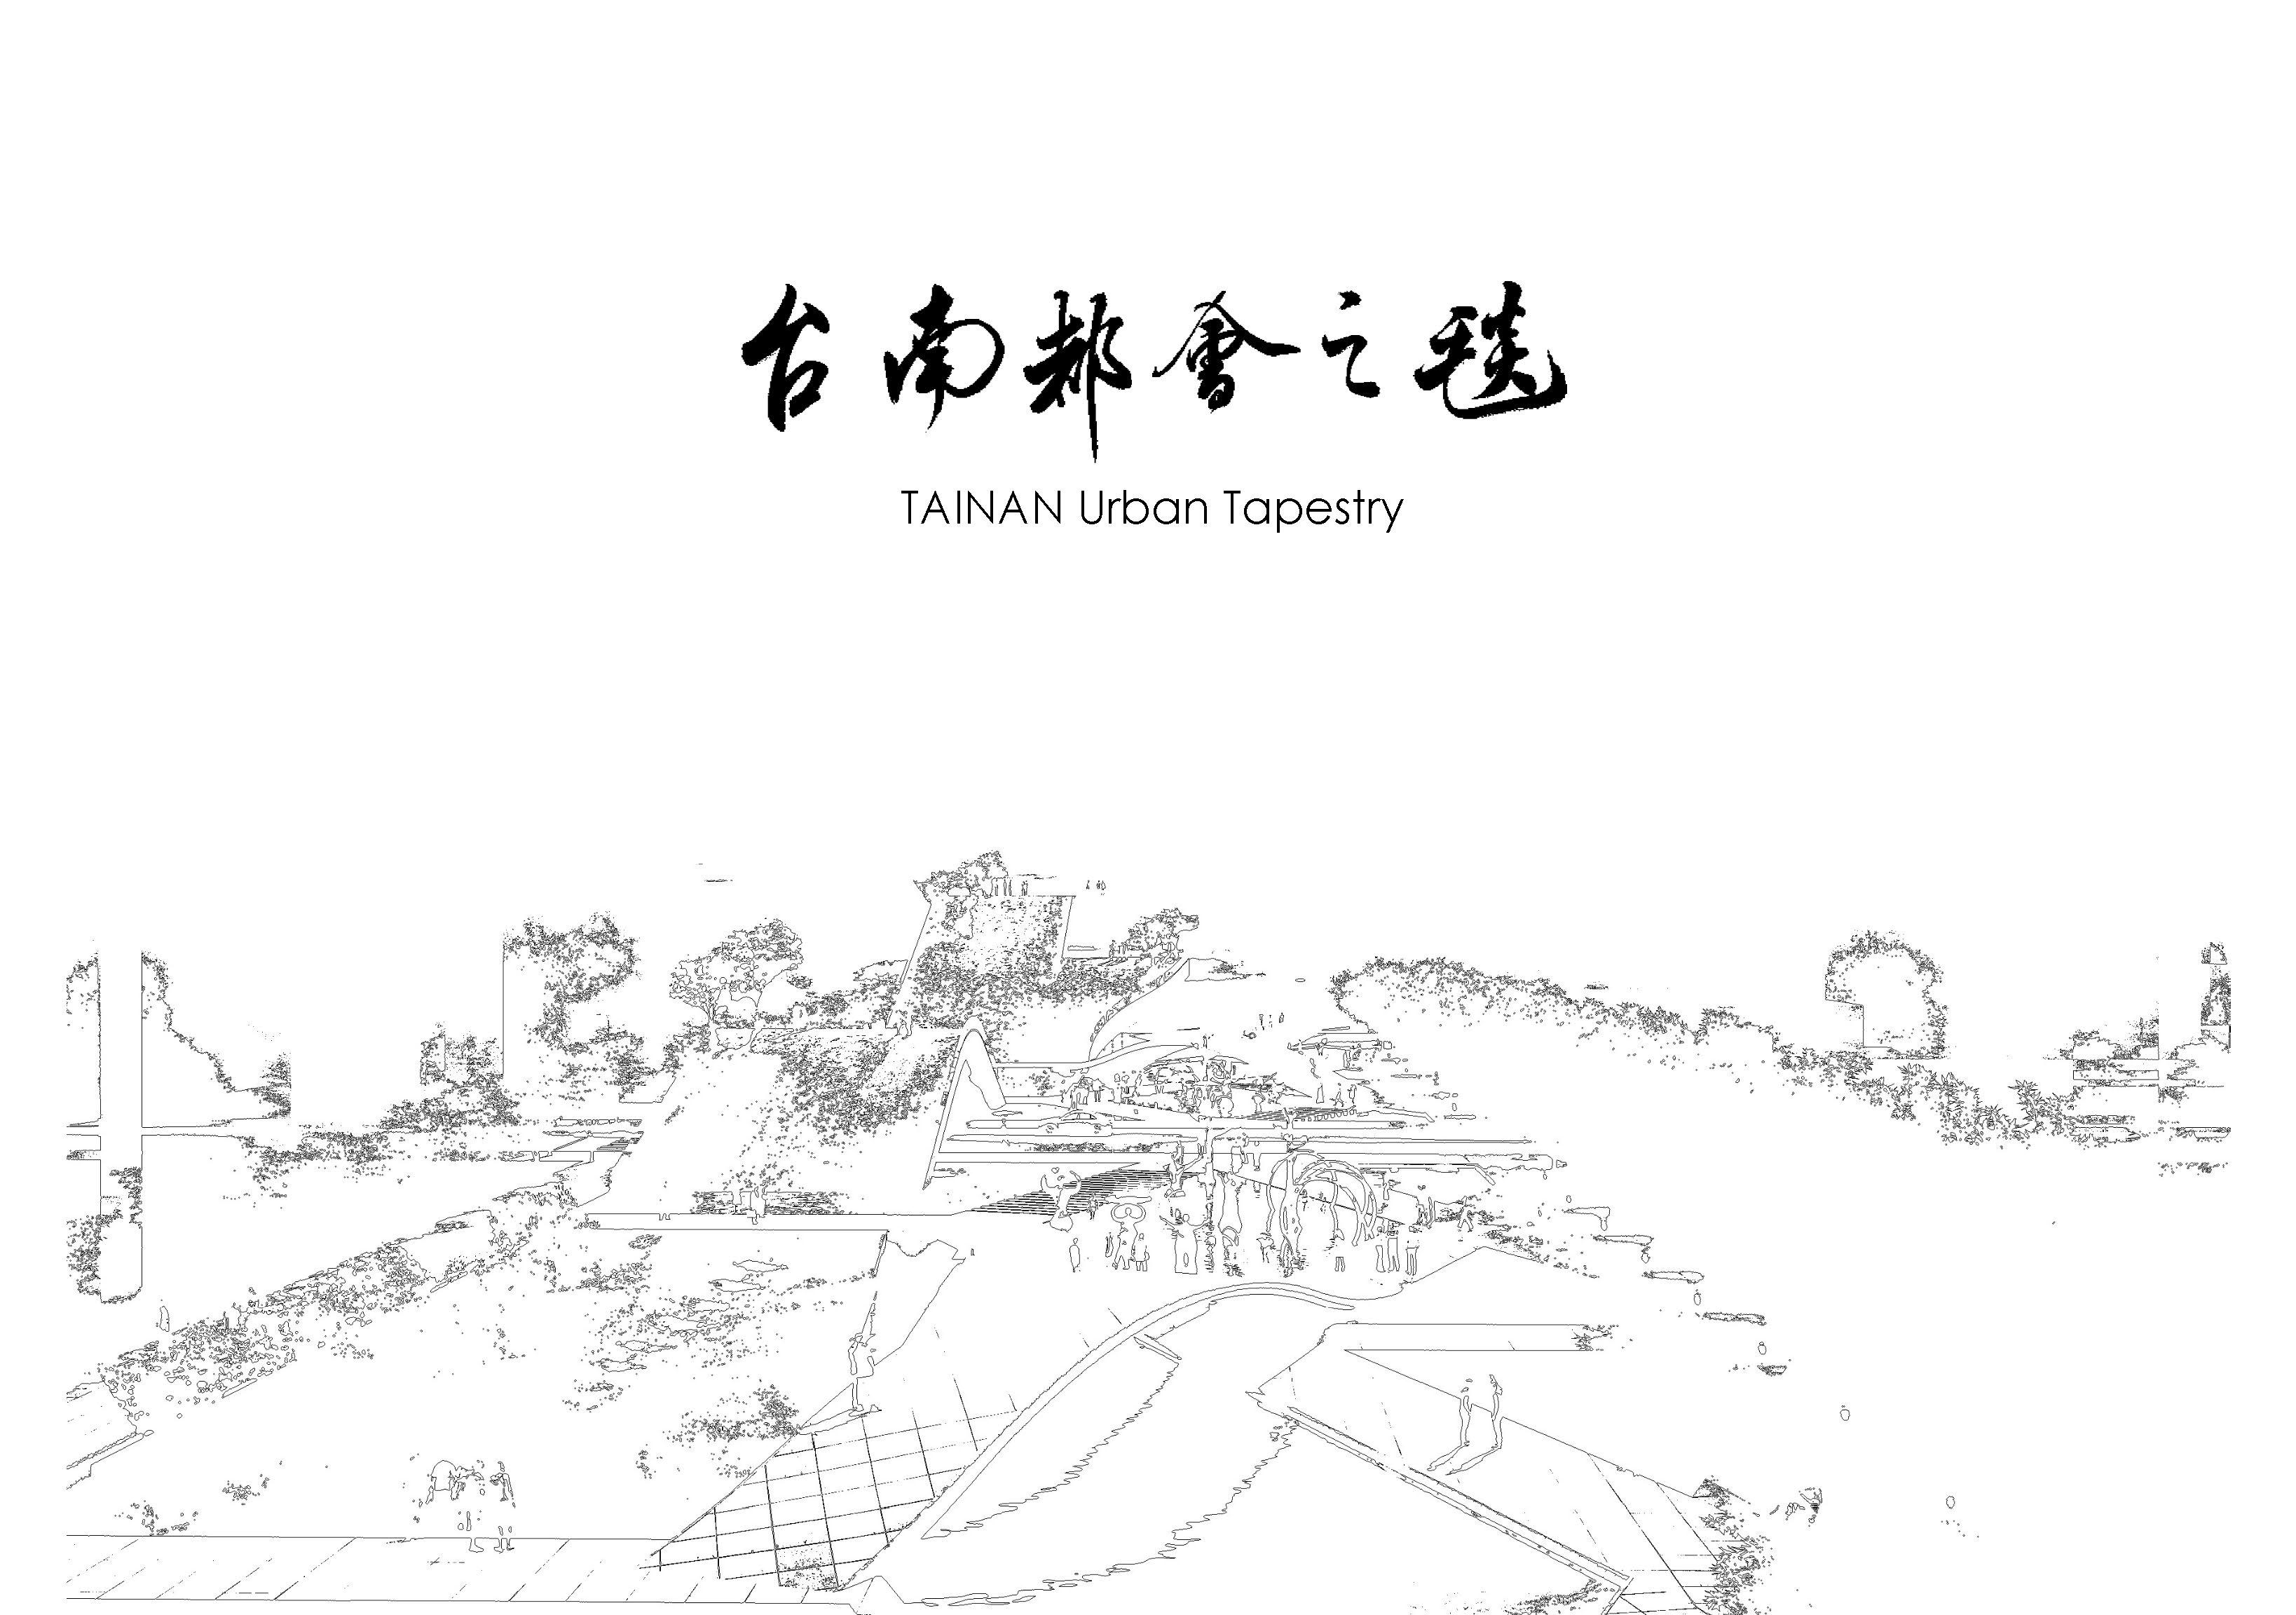 Urban Tapestry (Tainan)